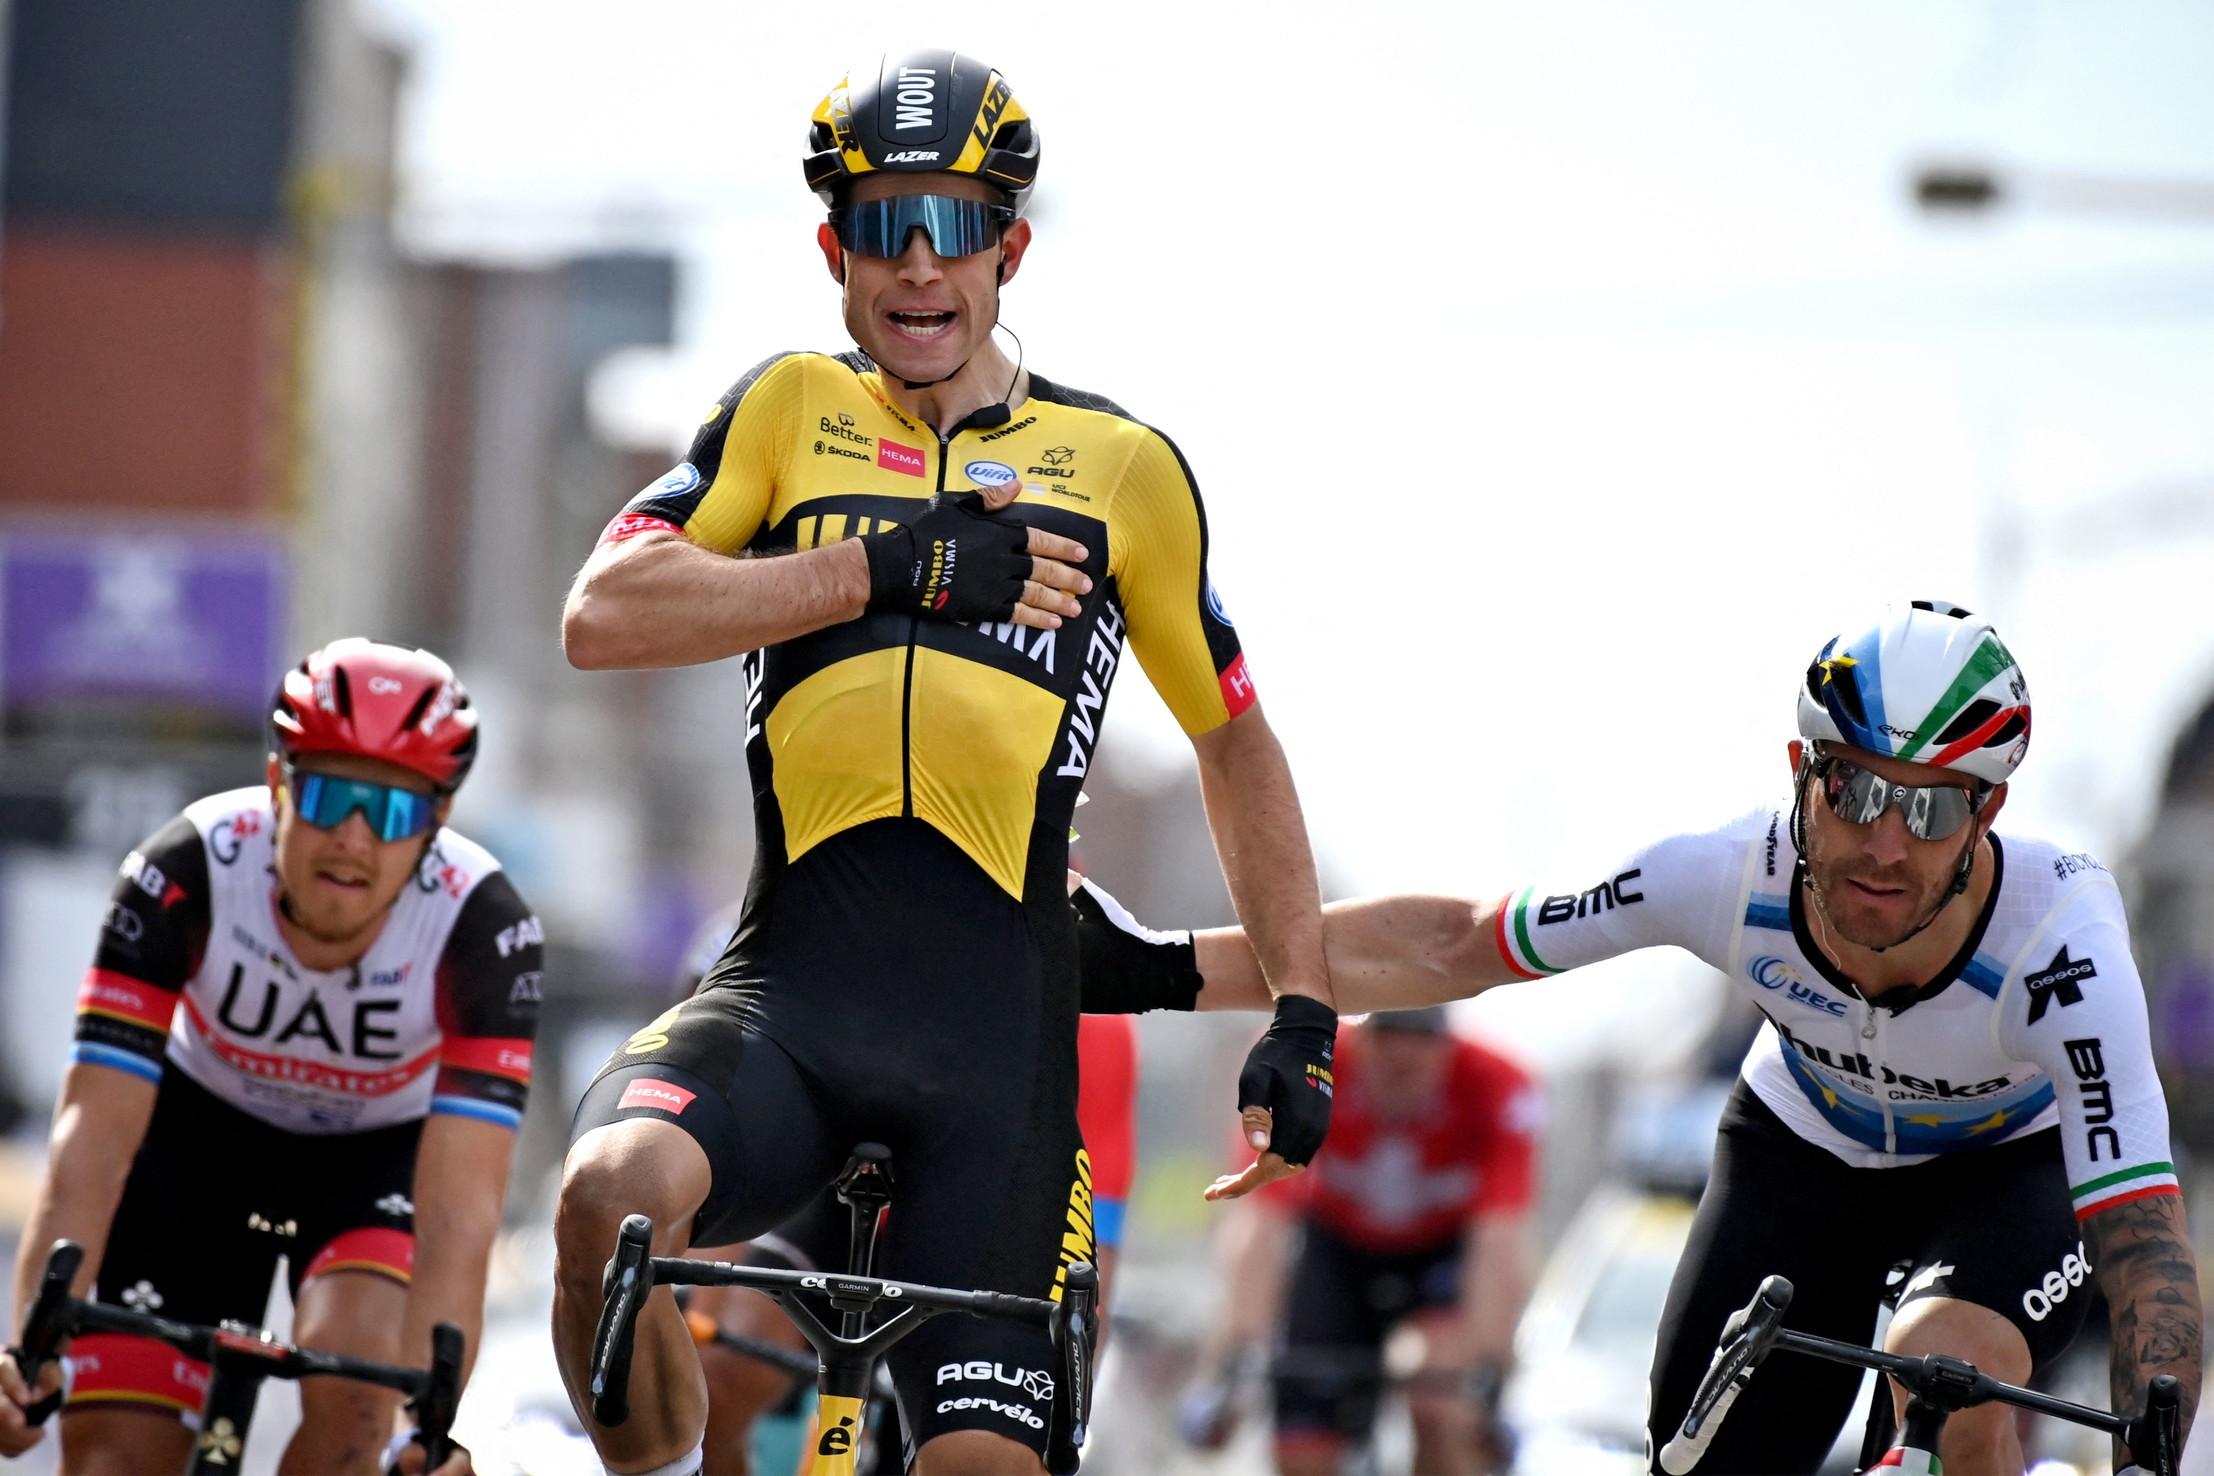 iI campione italiano ed europeo in carica, Giacomo Nizzolo (Team Qhubeka-Assos).